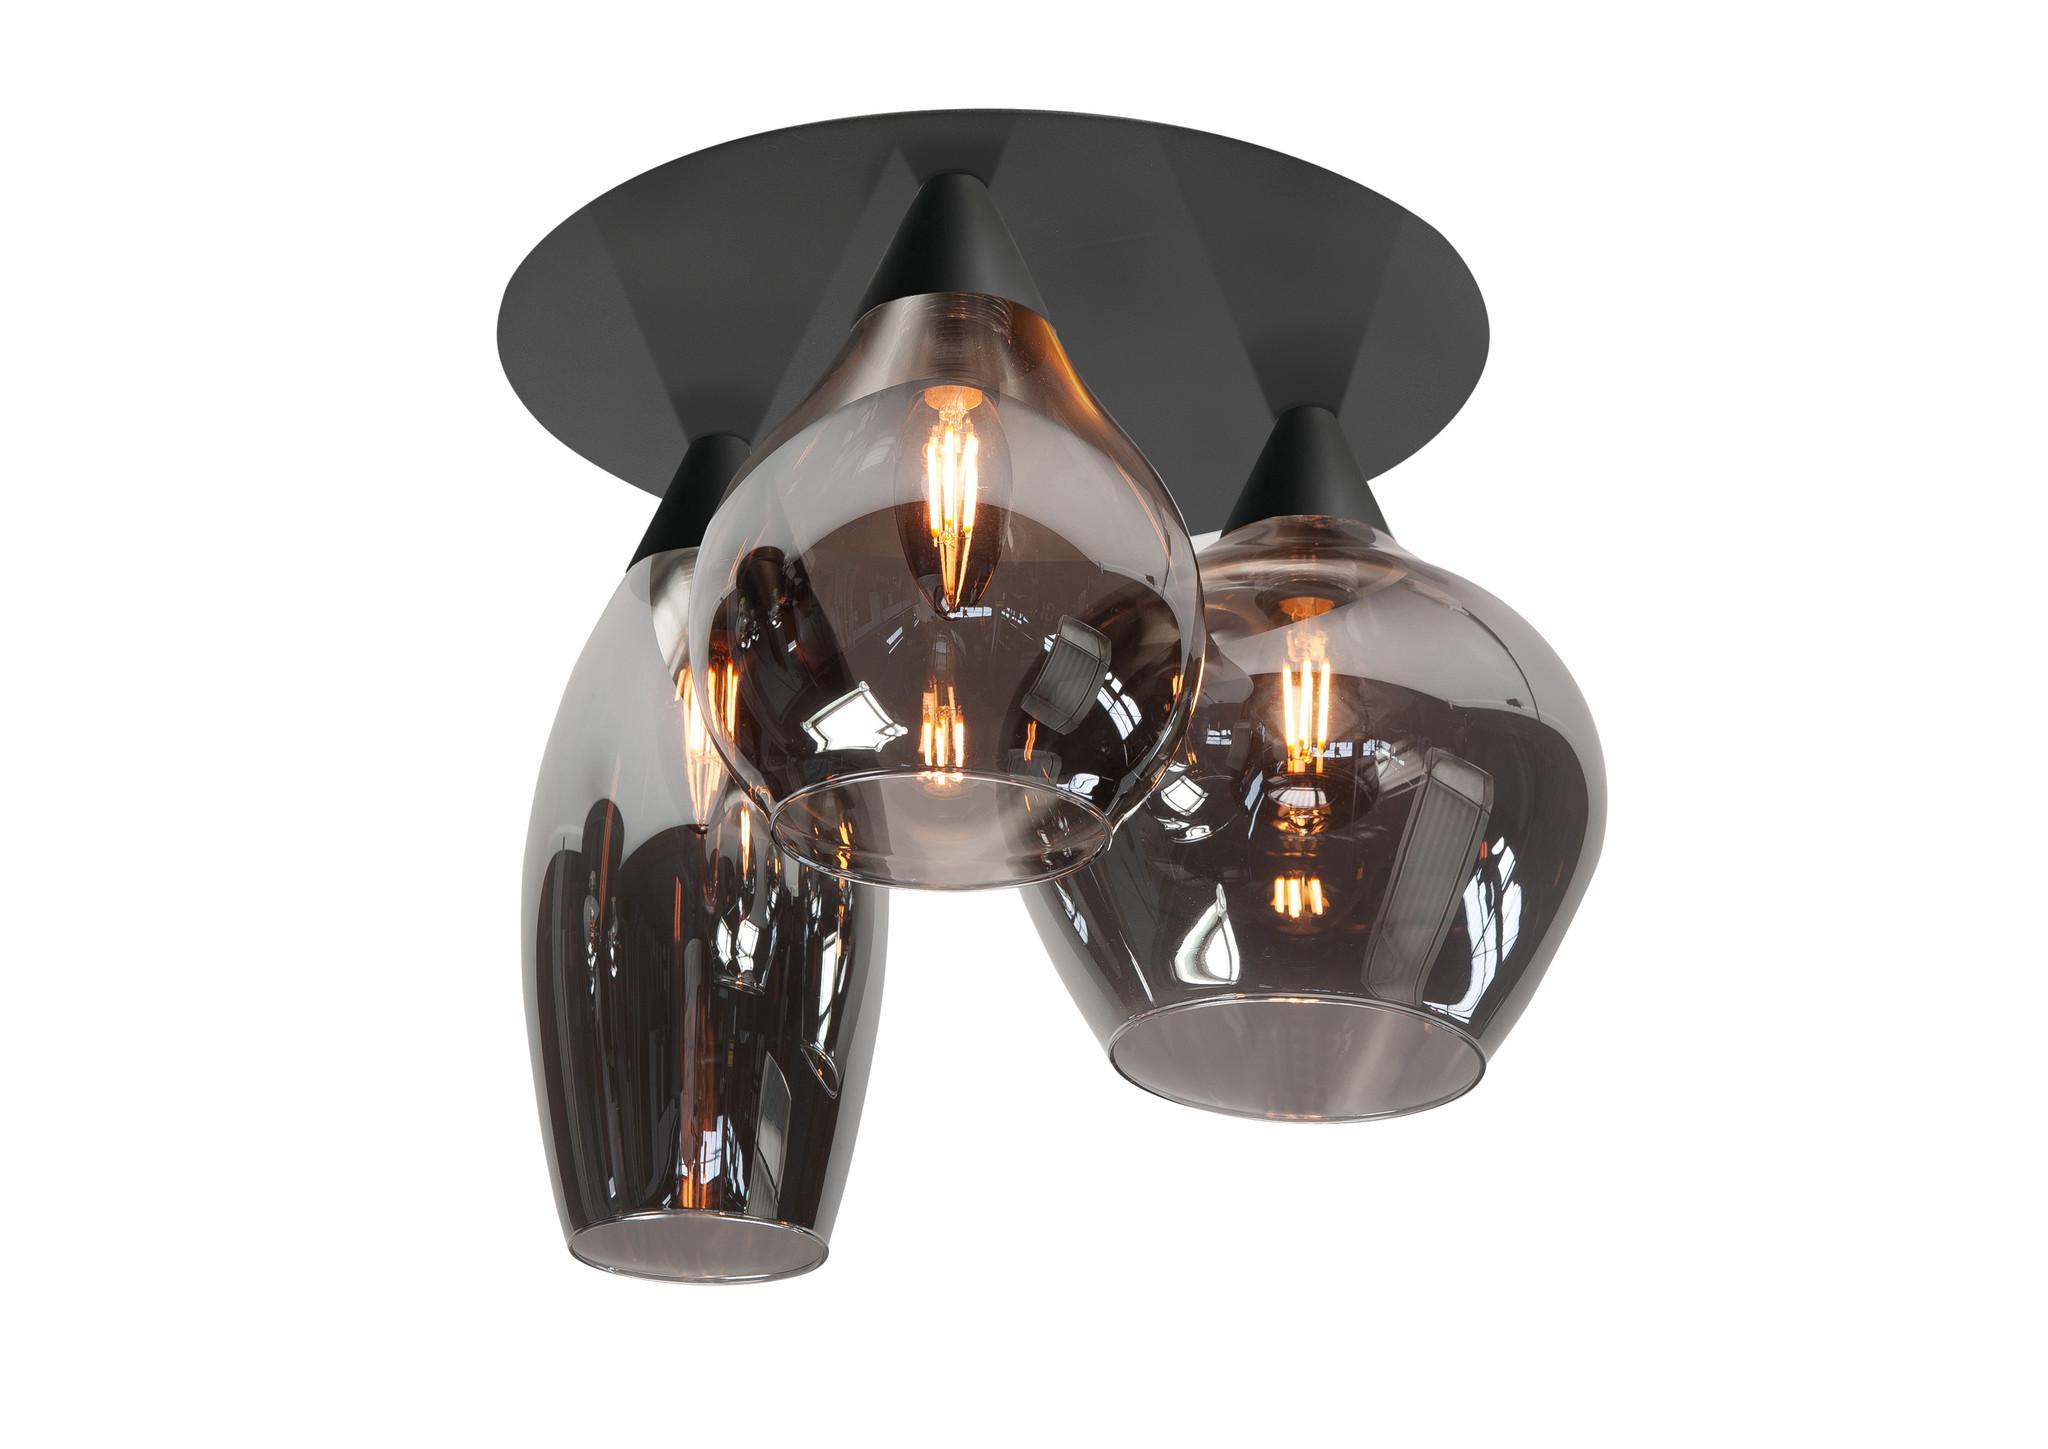 Plafondlamp Cambio Black & Smoke Glas 32cm � 3 Lichts